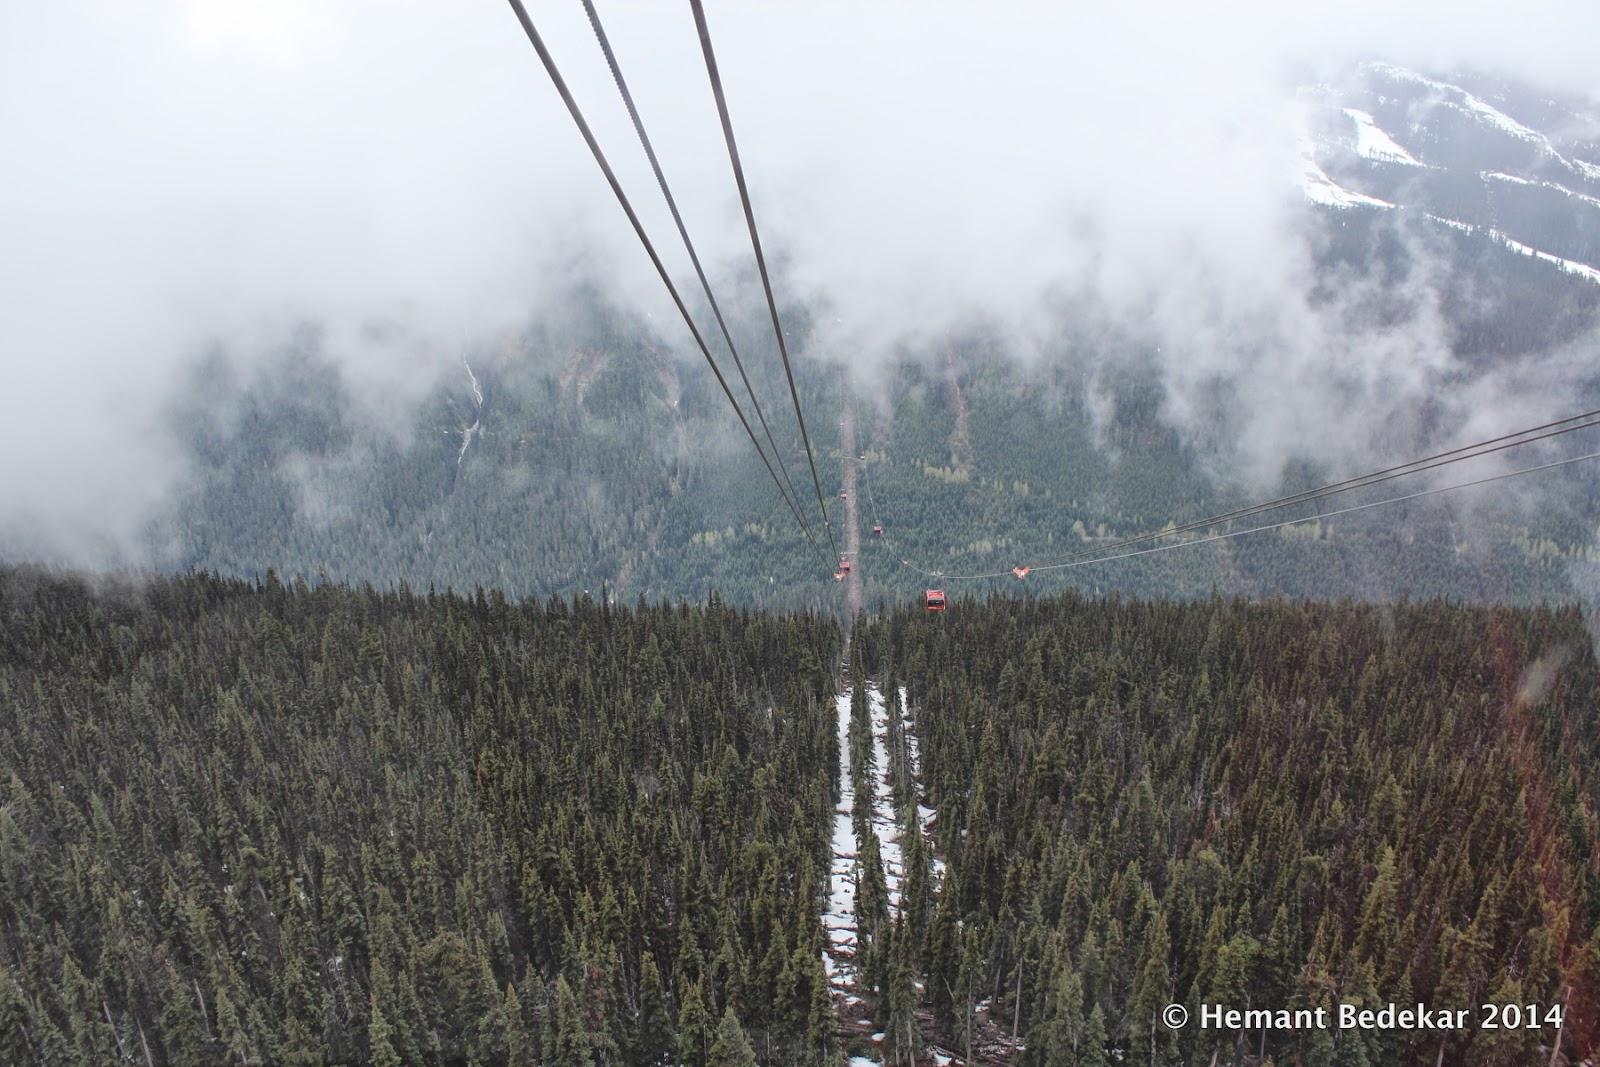 The Peak2Peak Gondola between Whistler and BlackComb mountains (https://en.wikipedia.org/wiki/Peak_2_Peak_Gondola)